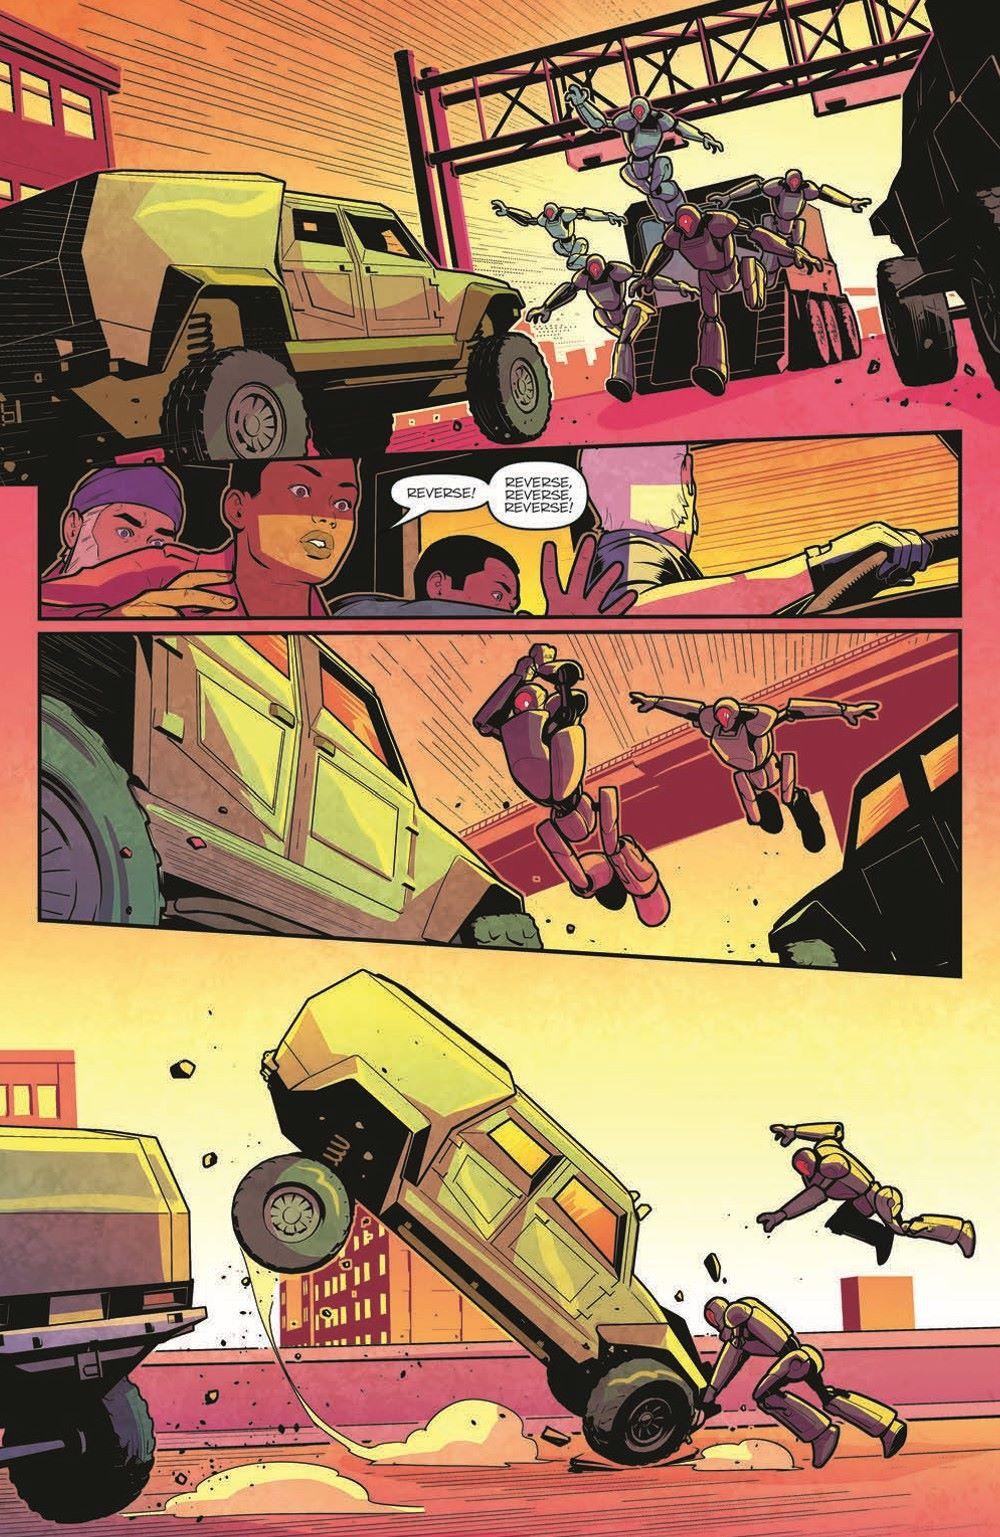 GIJoe_CastleFall-pr-6 ComicList Previews: G.I. JOE CASTLE FALL #1